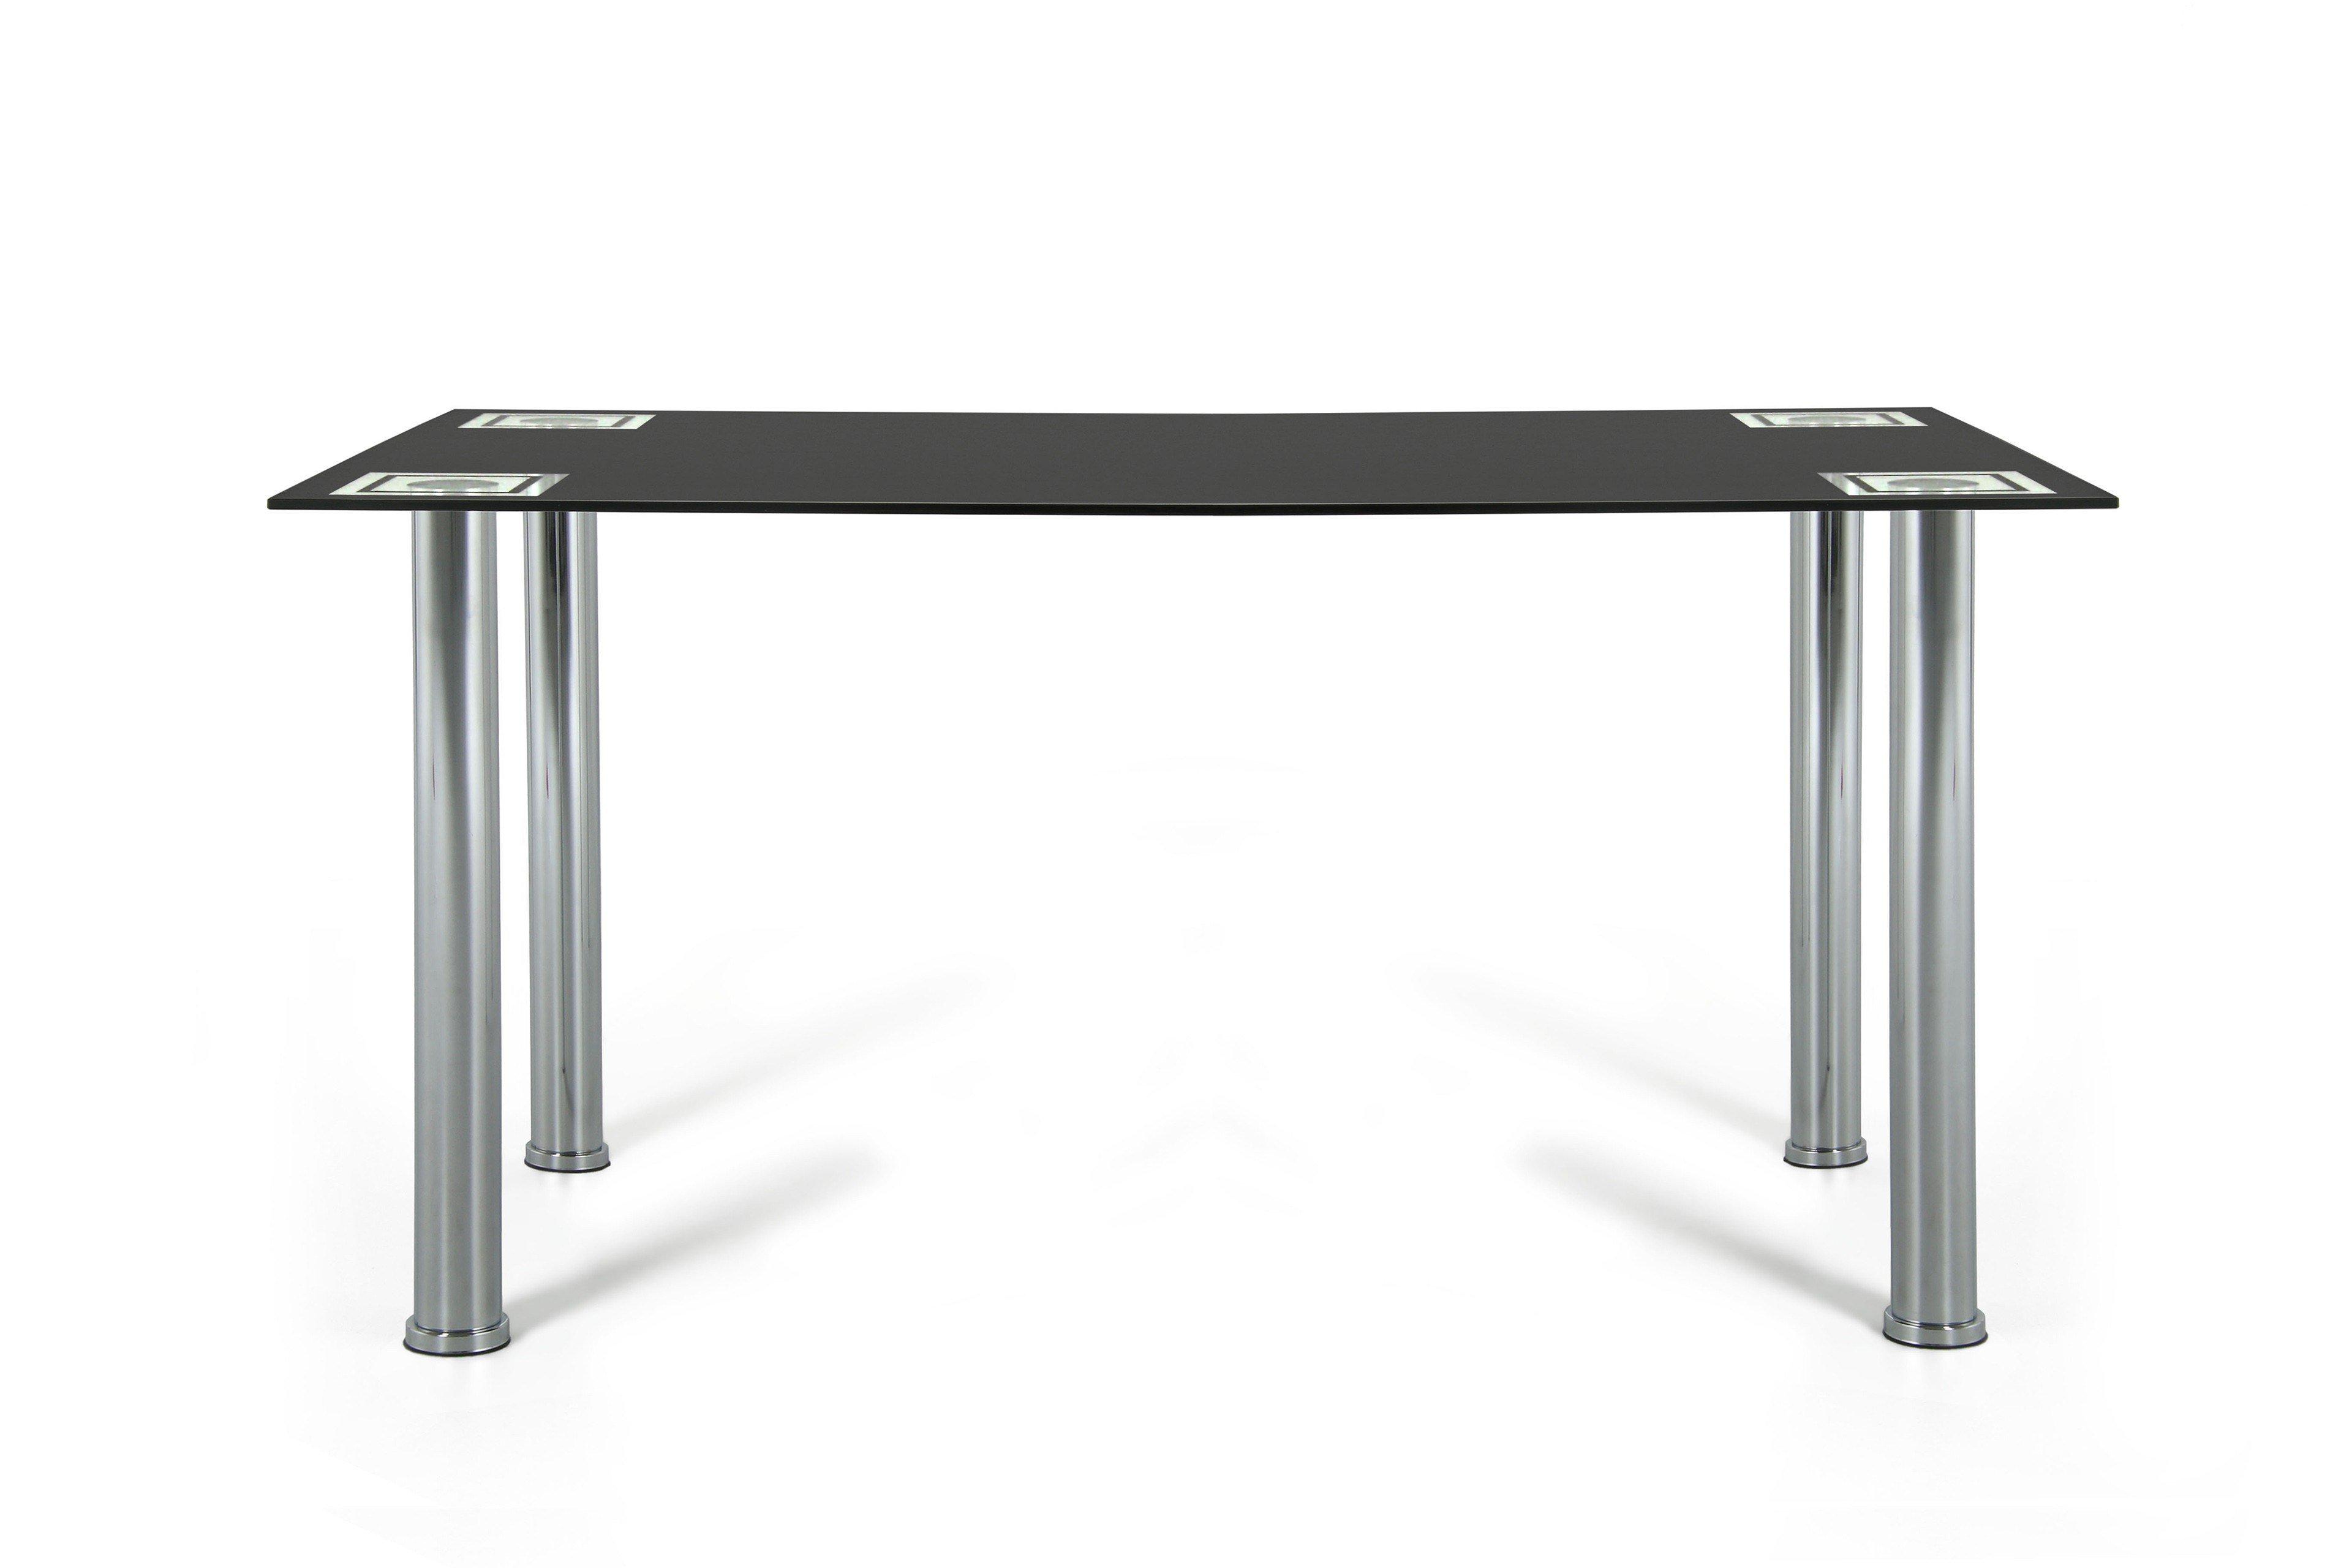 kollektion letz esstisch anny glas metall m bel letz ihr online shop. Black Bedroom Furniture Sets. Home Design Ideas